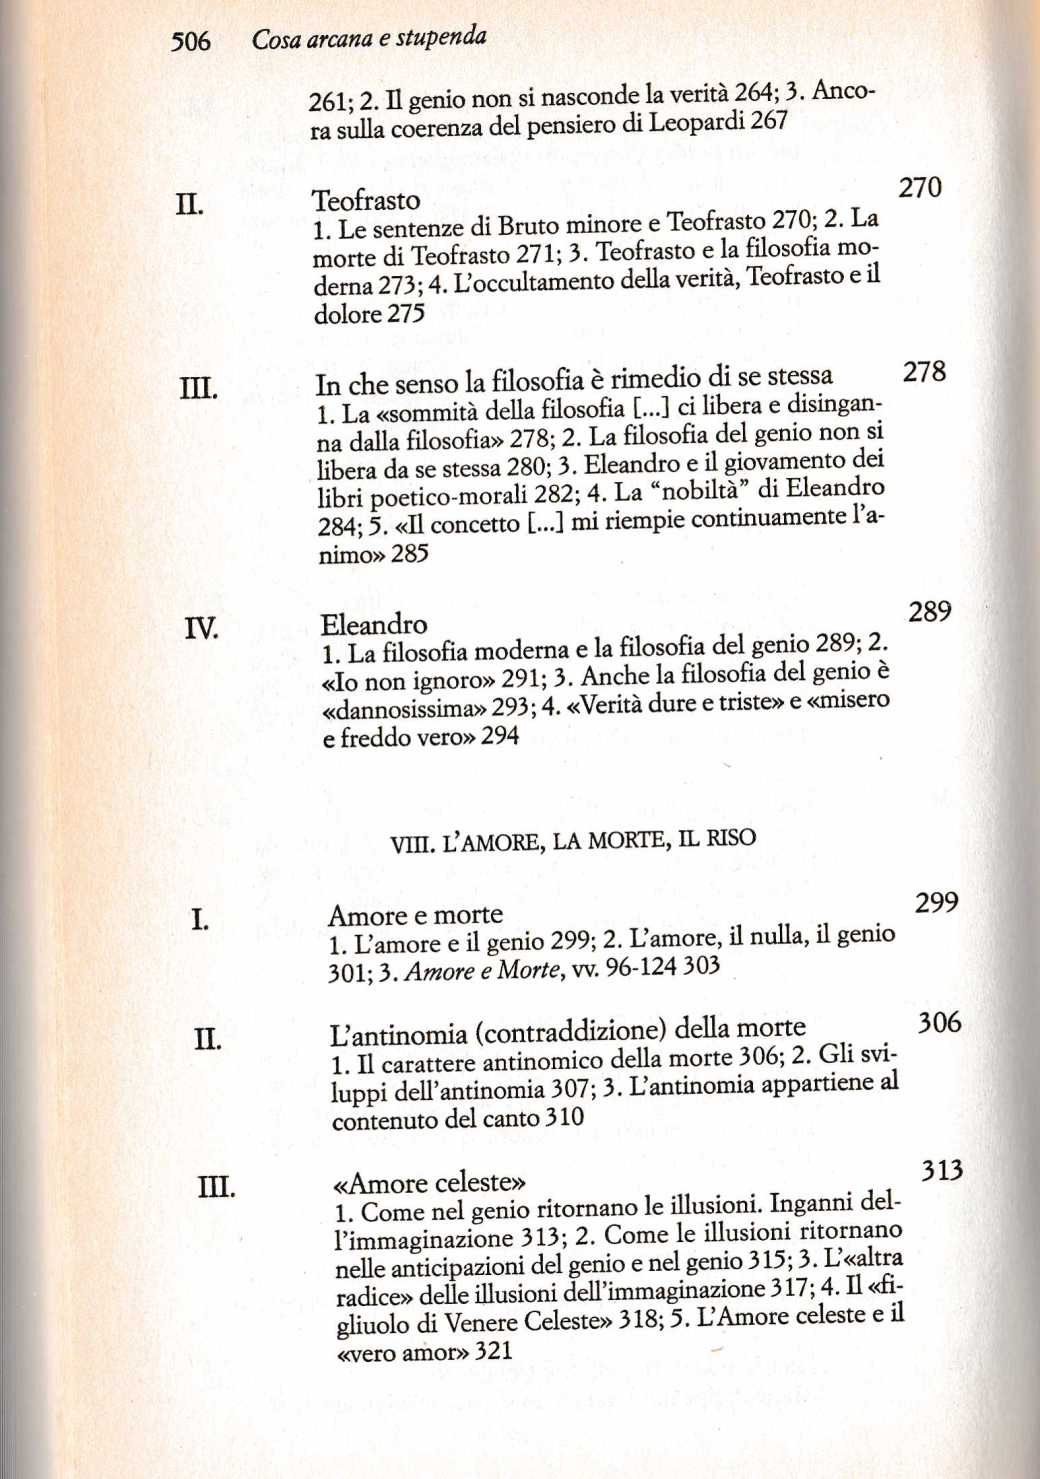 arcanastupenda4451